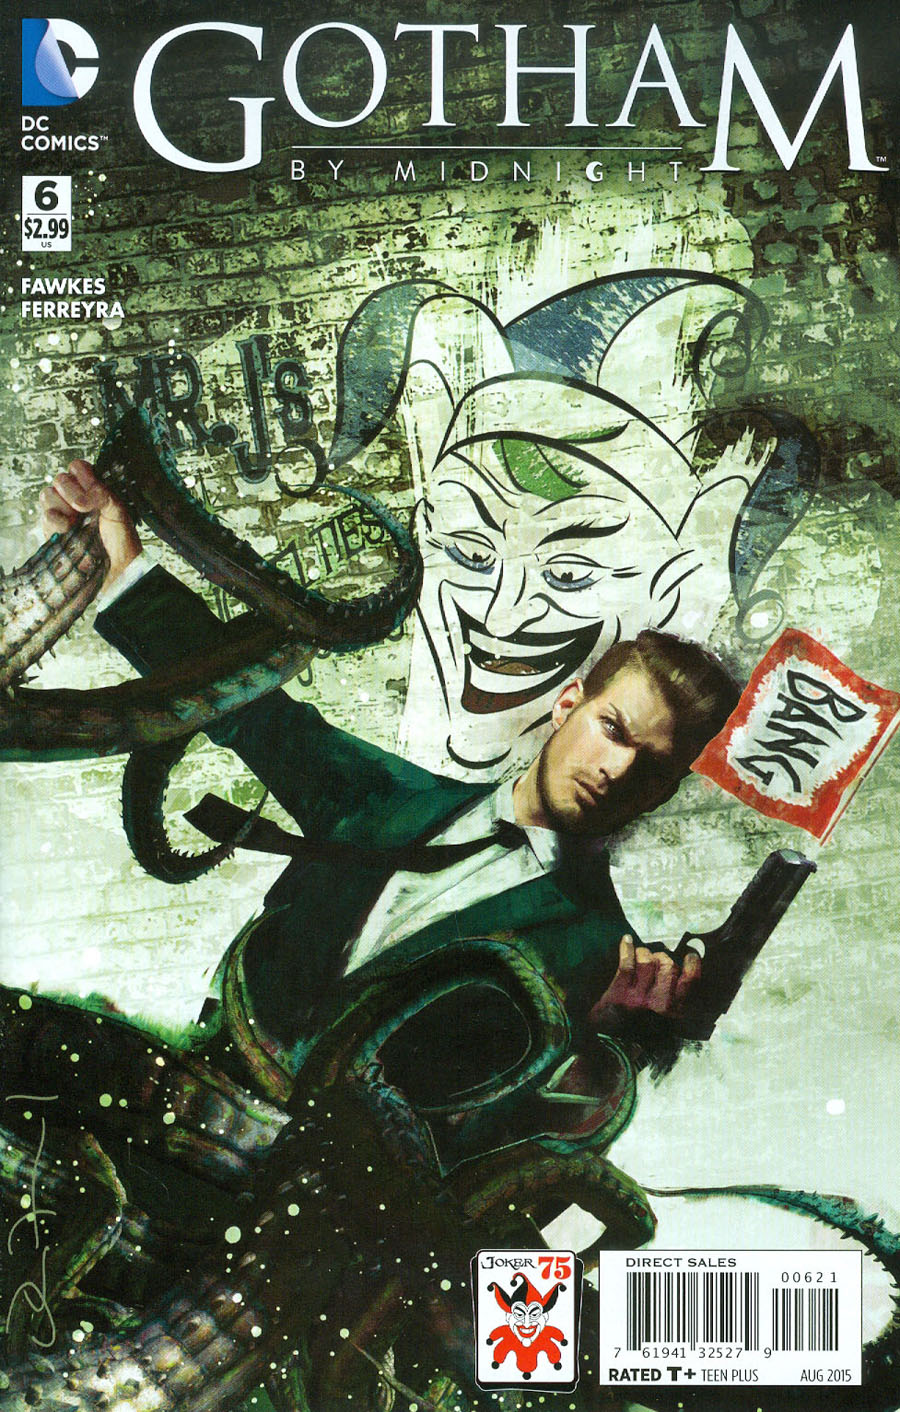 Gotham By Midnight #6 Cover B Variant John Van Fleet The Joker 75th Anniversary Cover